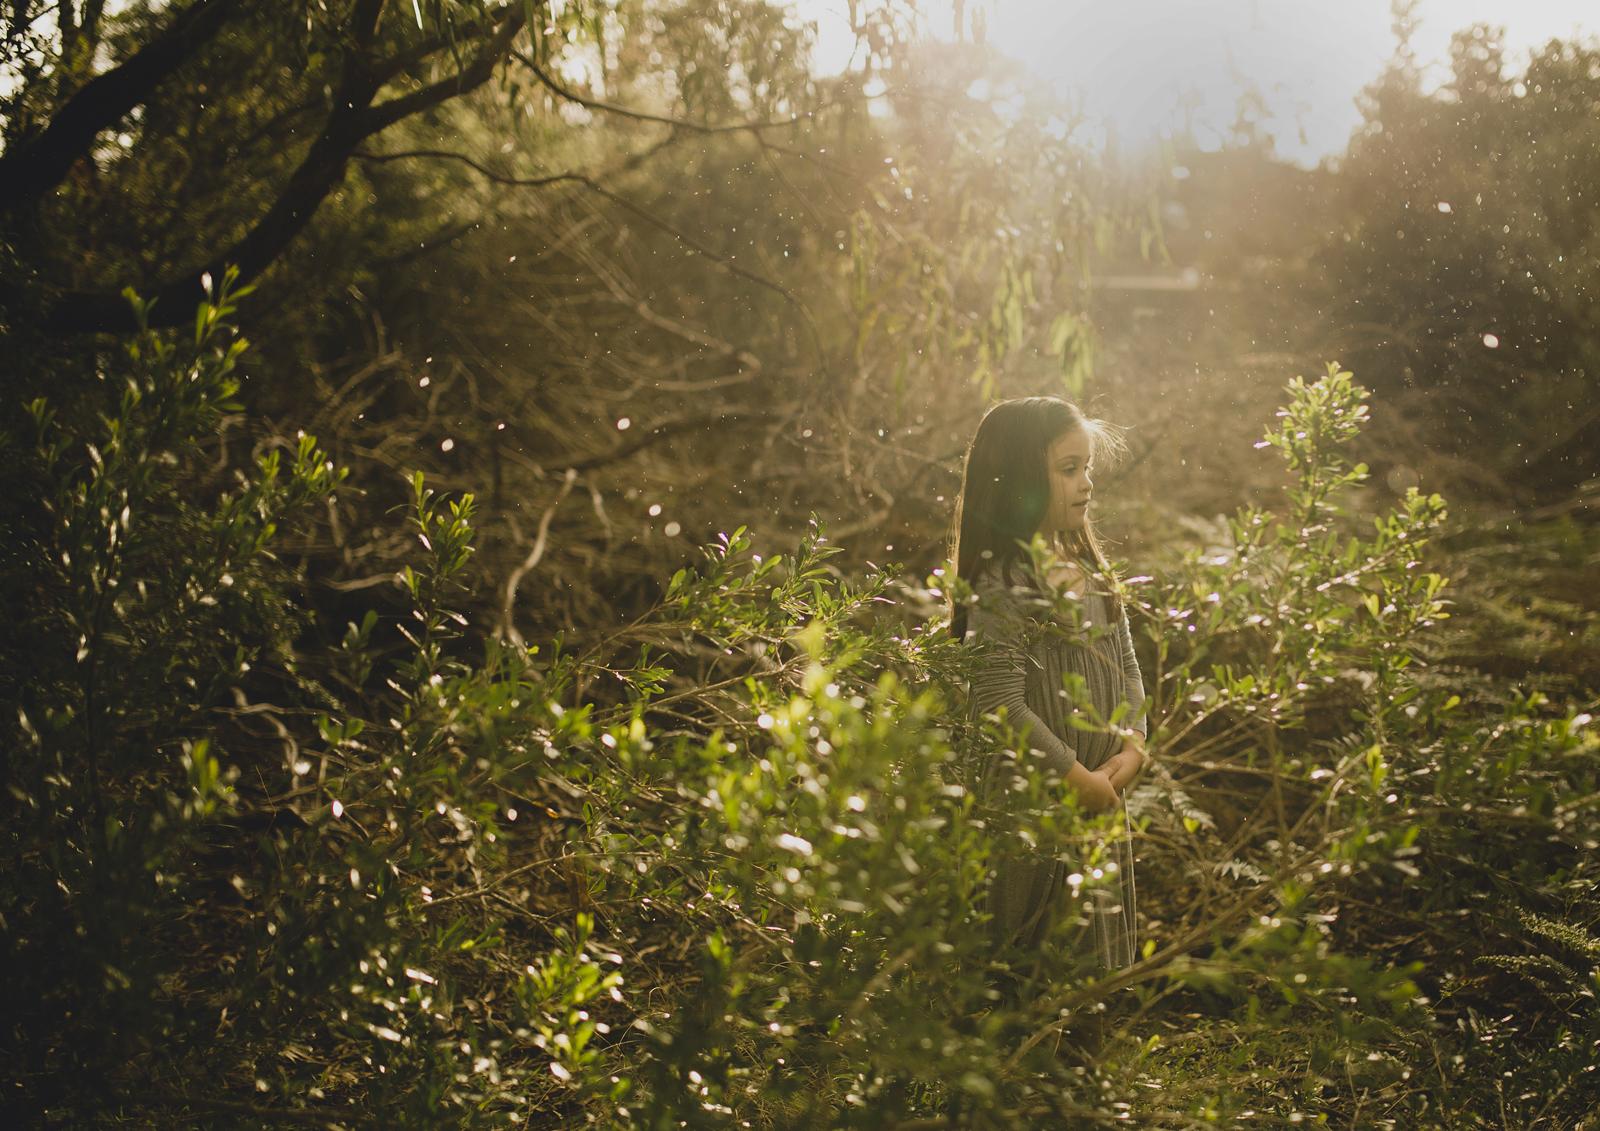 Little girl on an adventure in shrub land!